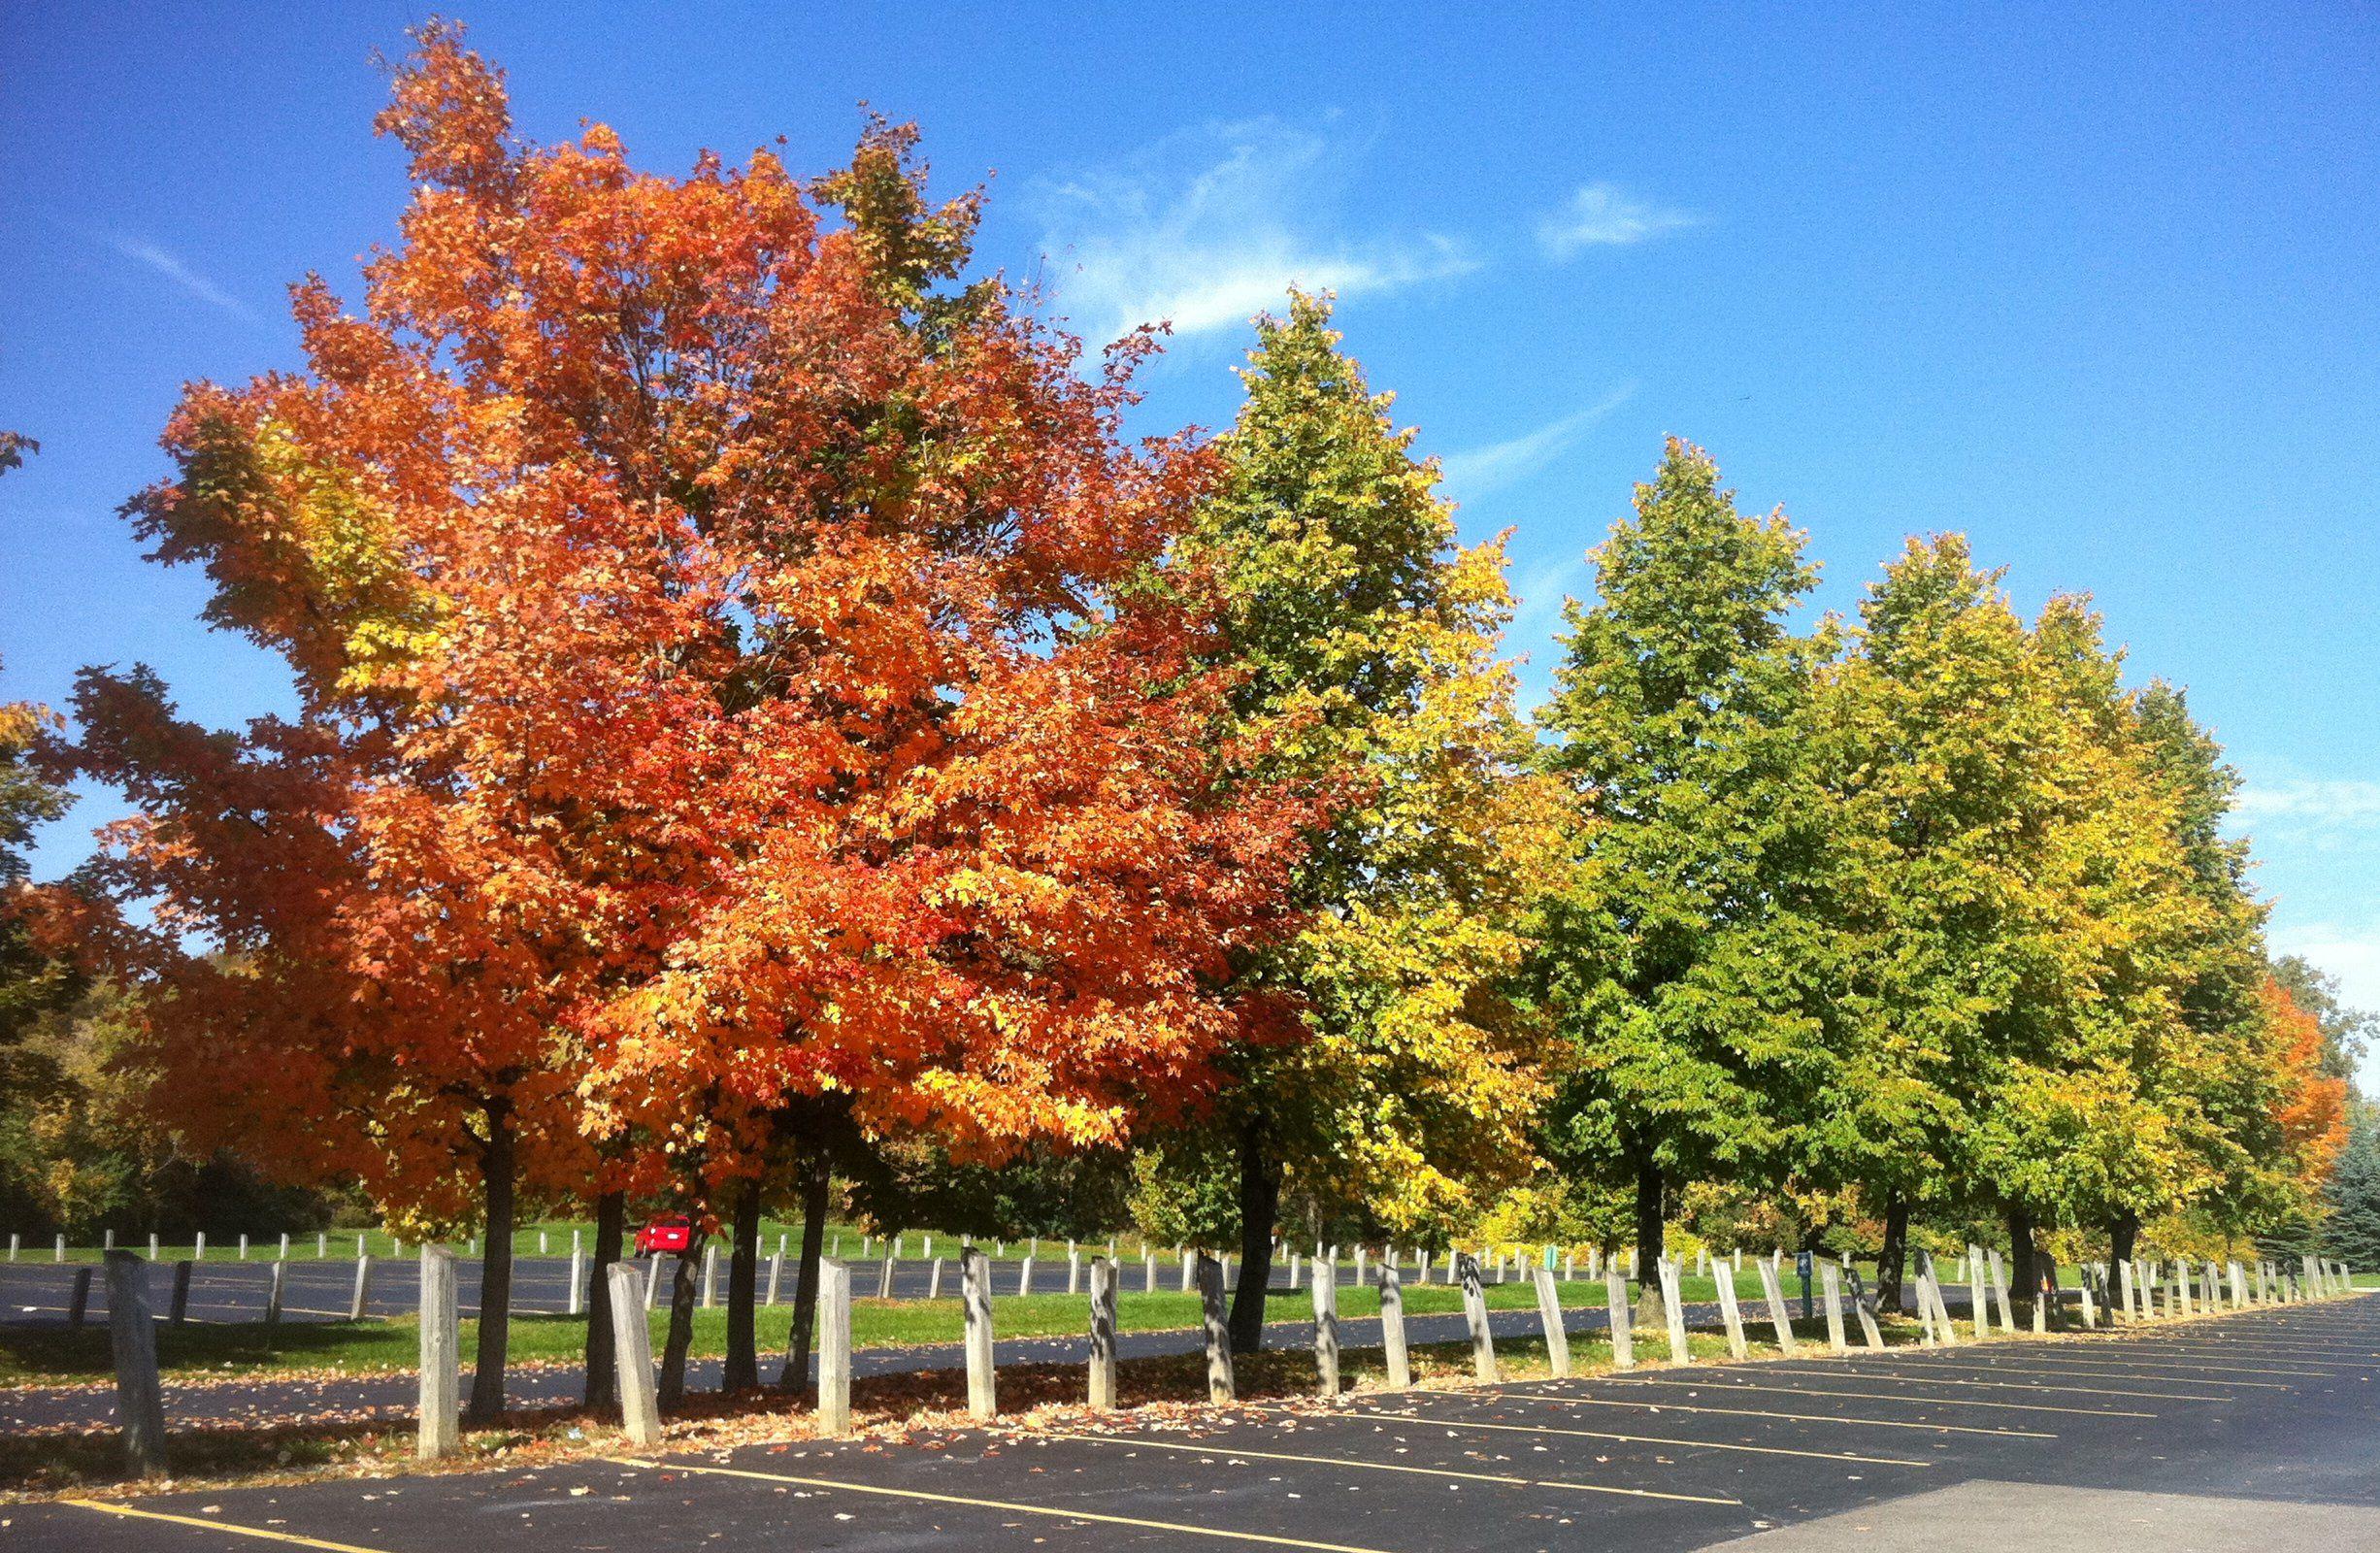 Maine Fall Foliage Wallpaper Fall Foliage Tours In Michigan